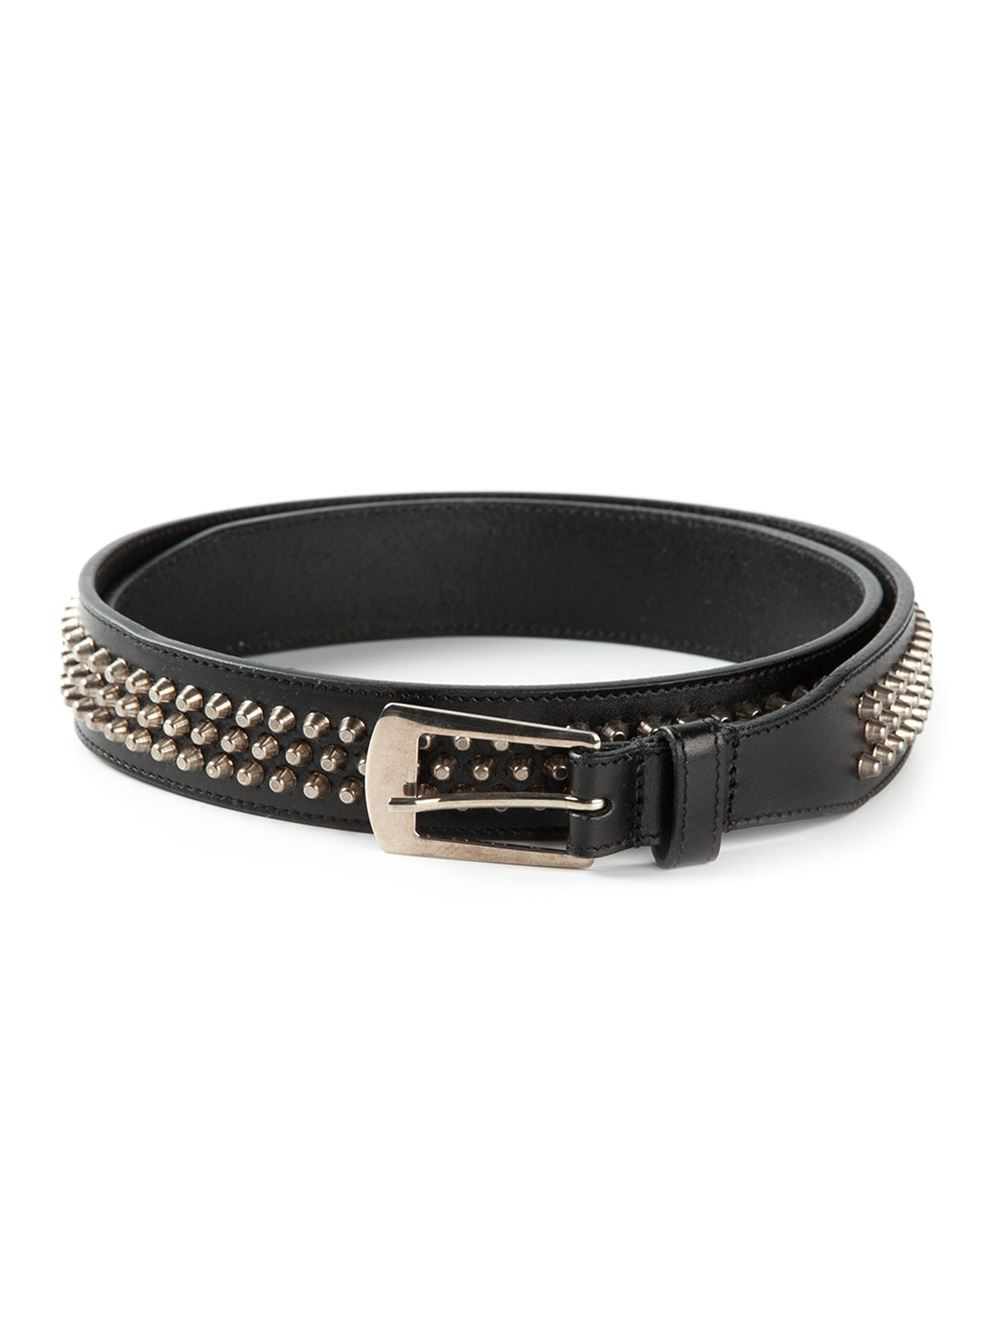 Studded Woven Leather Belt - Black Saint Laurent 4udY8U